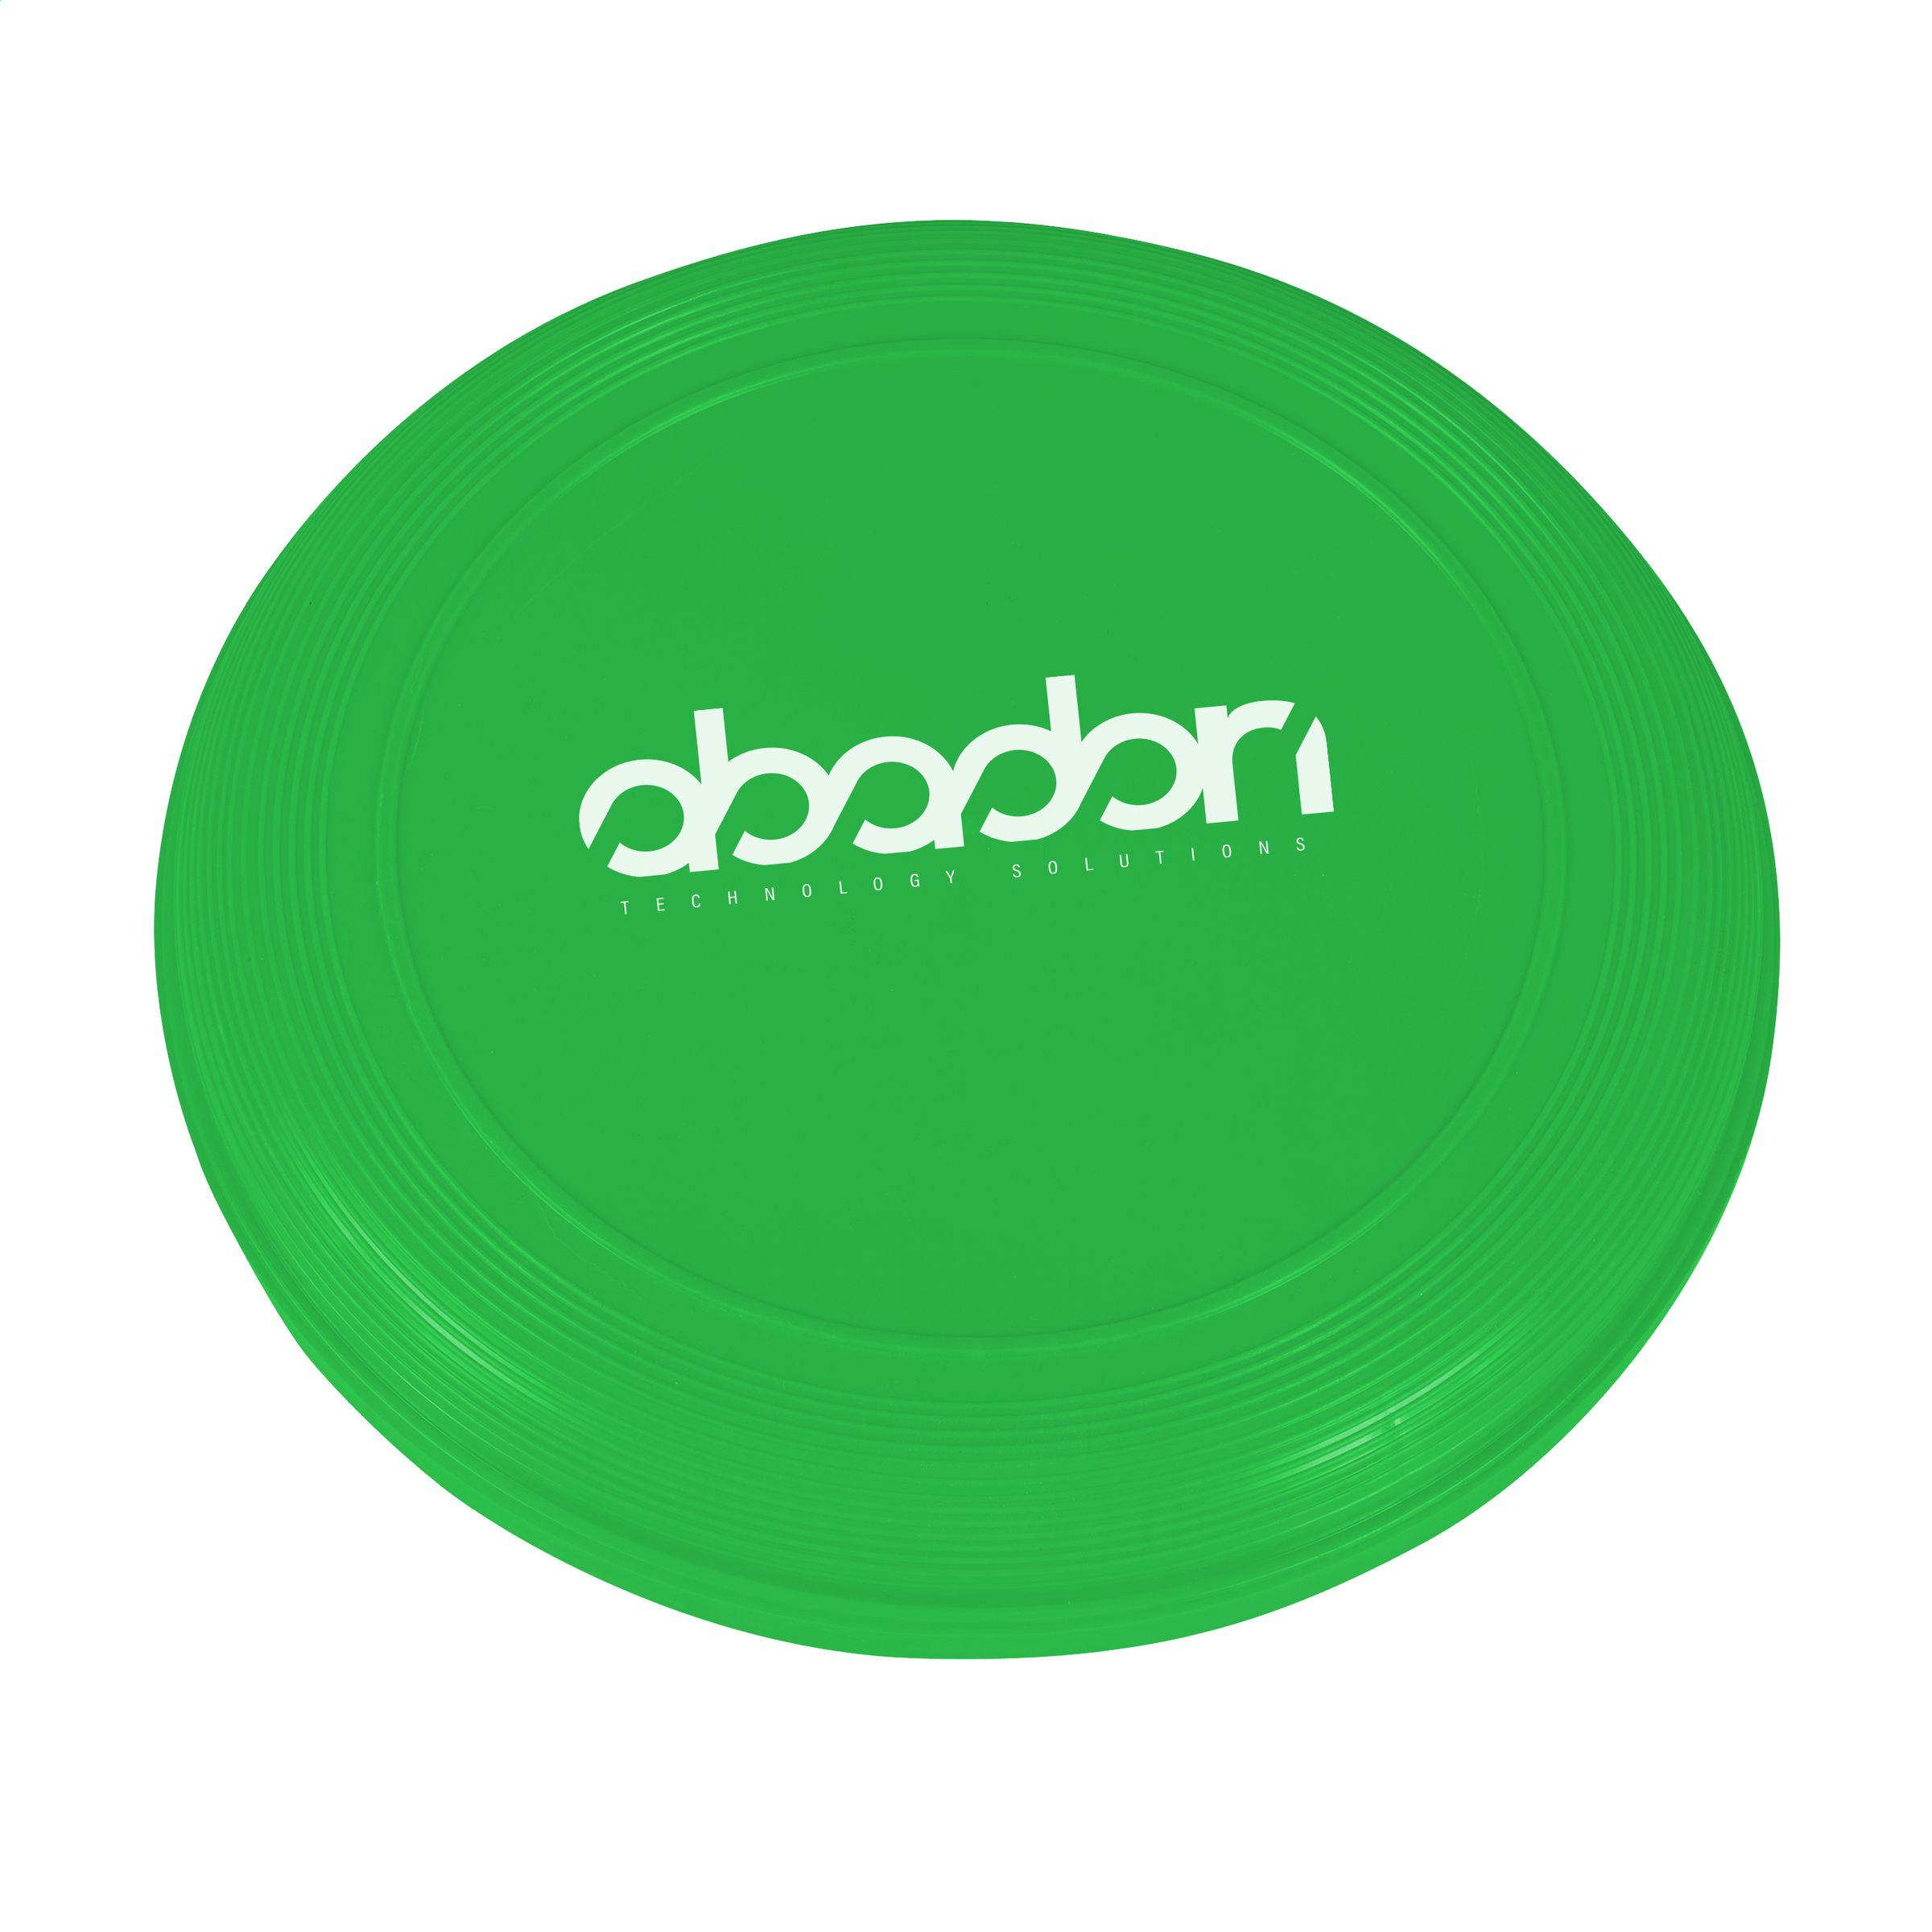 impresión de Ufo frisbee